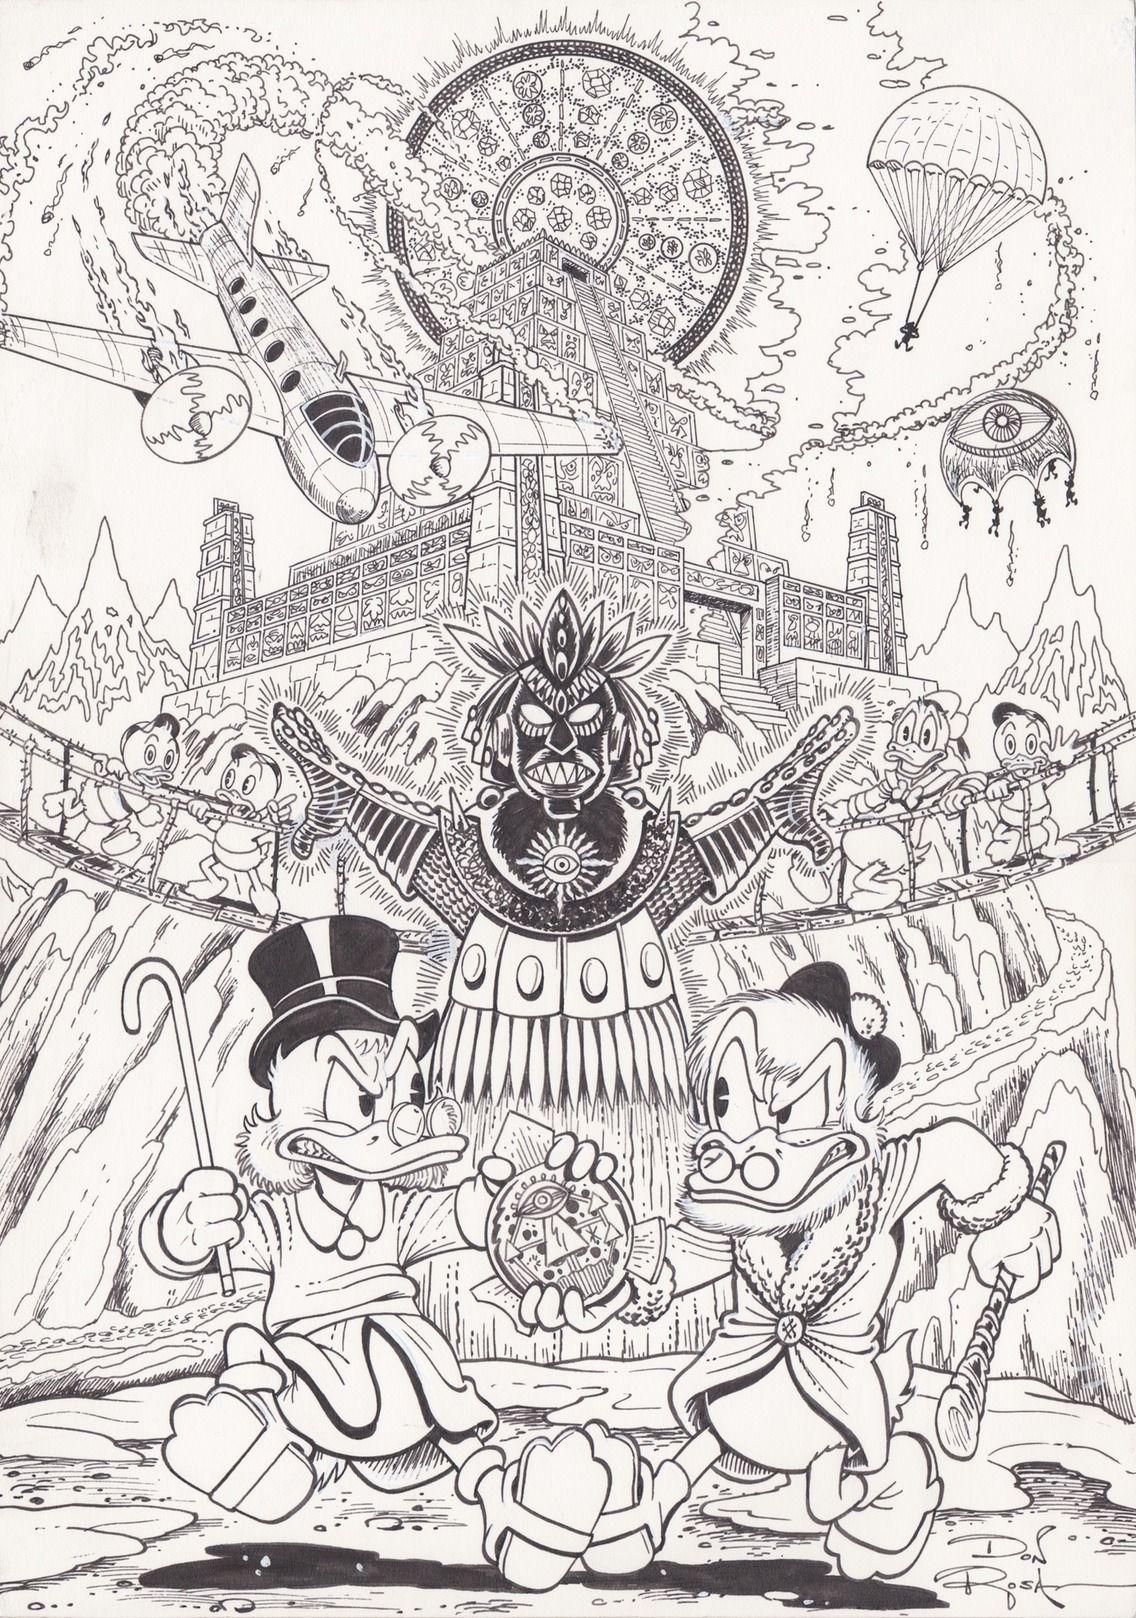 Picsou - The Son of the Sun par Don Rosa - original cover